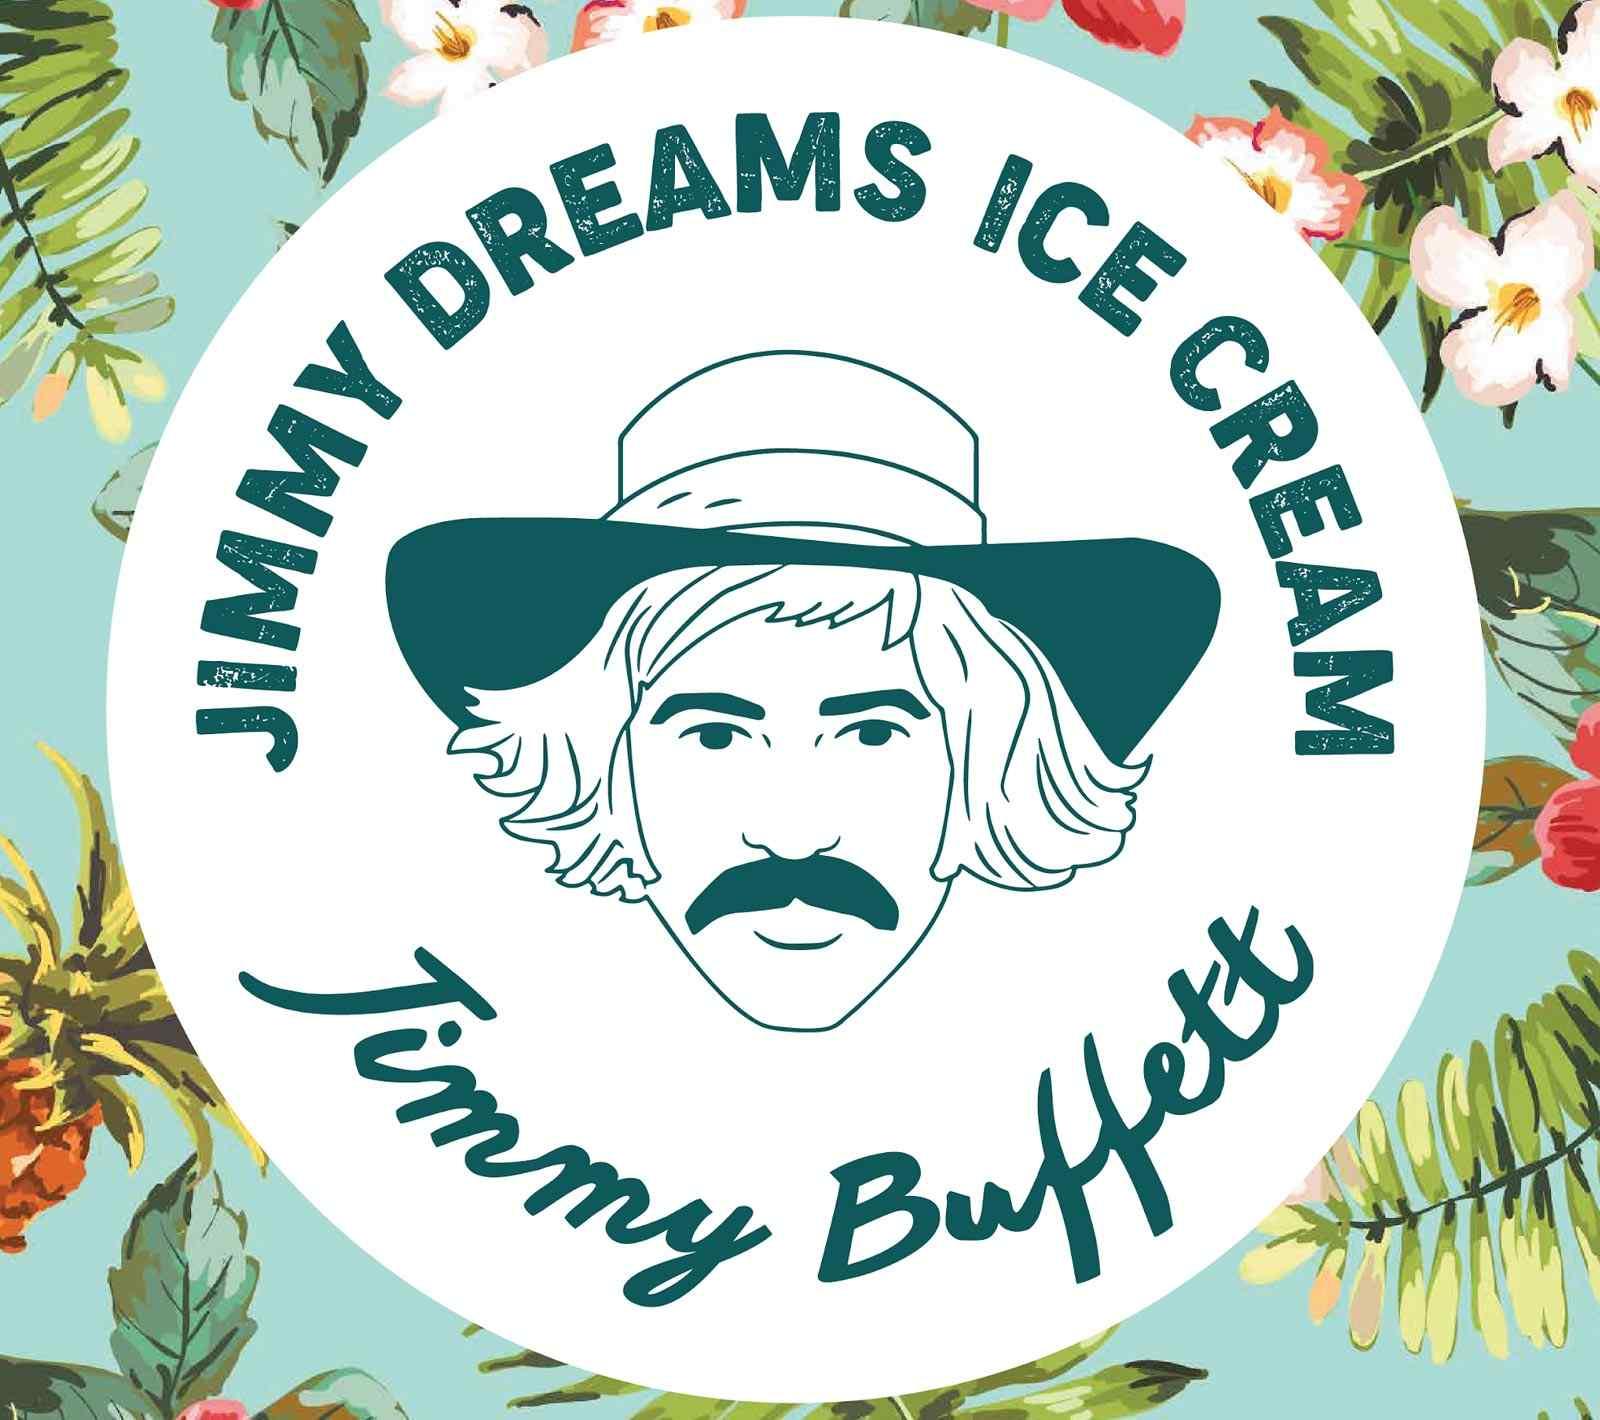 New SYDKBH-Themed Ice Cream!